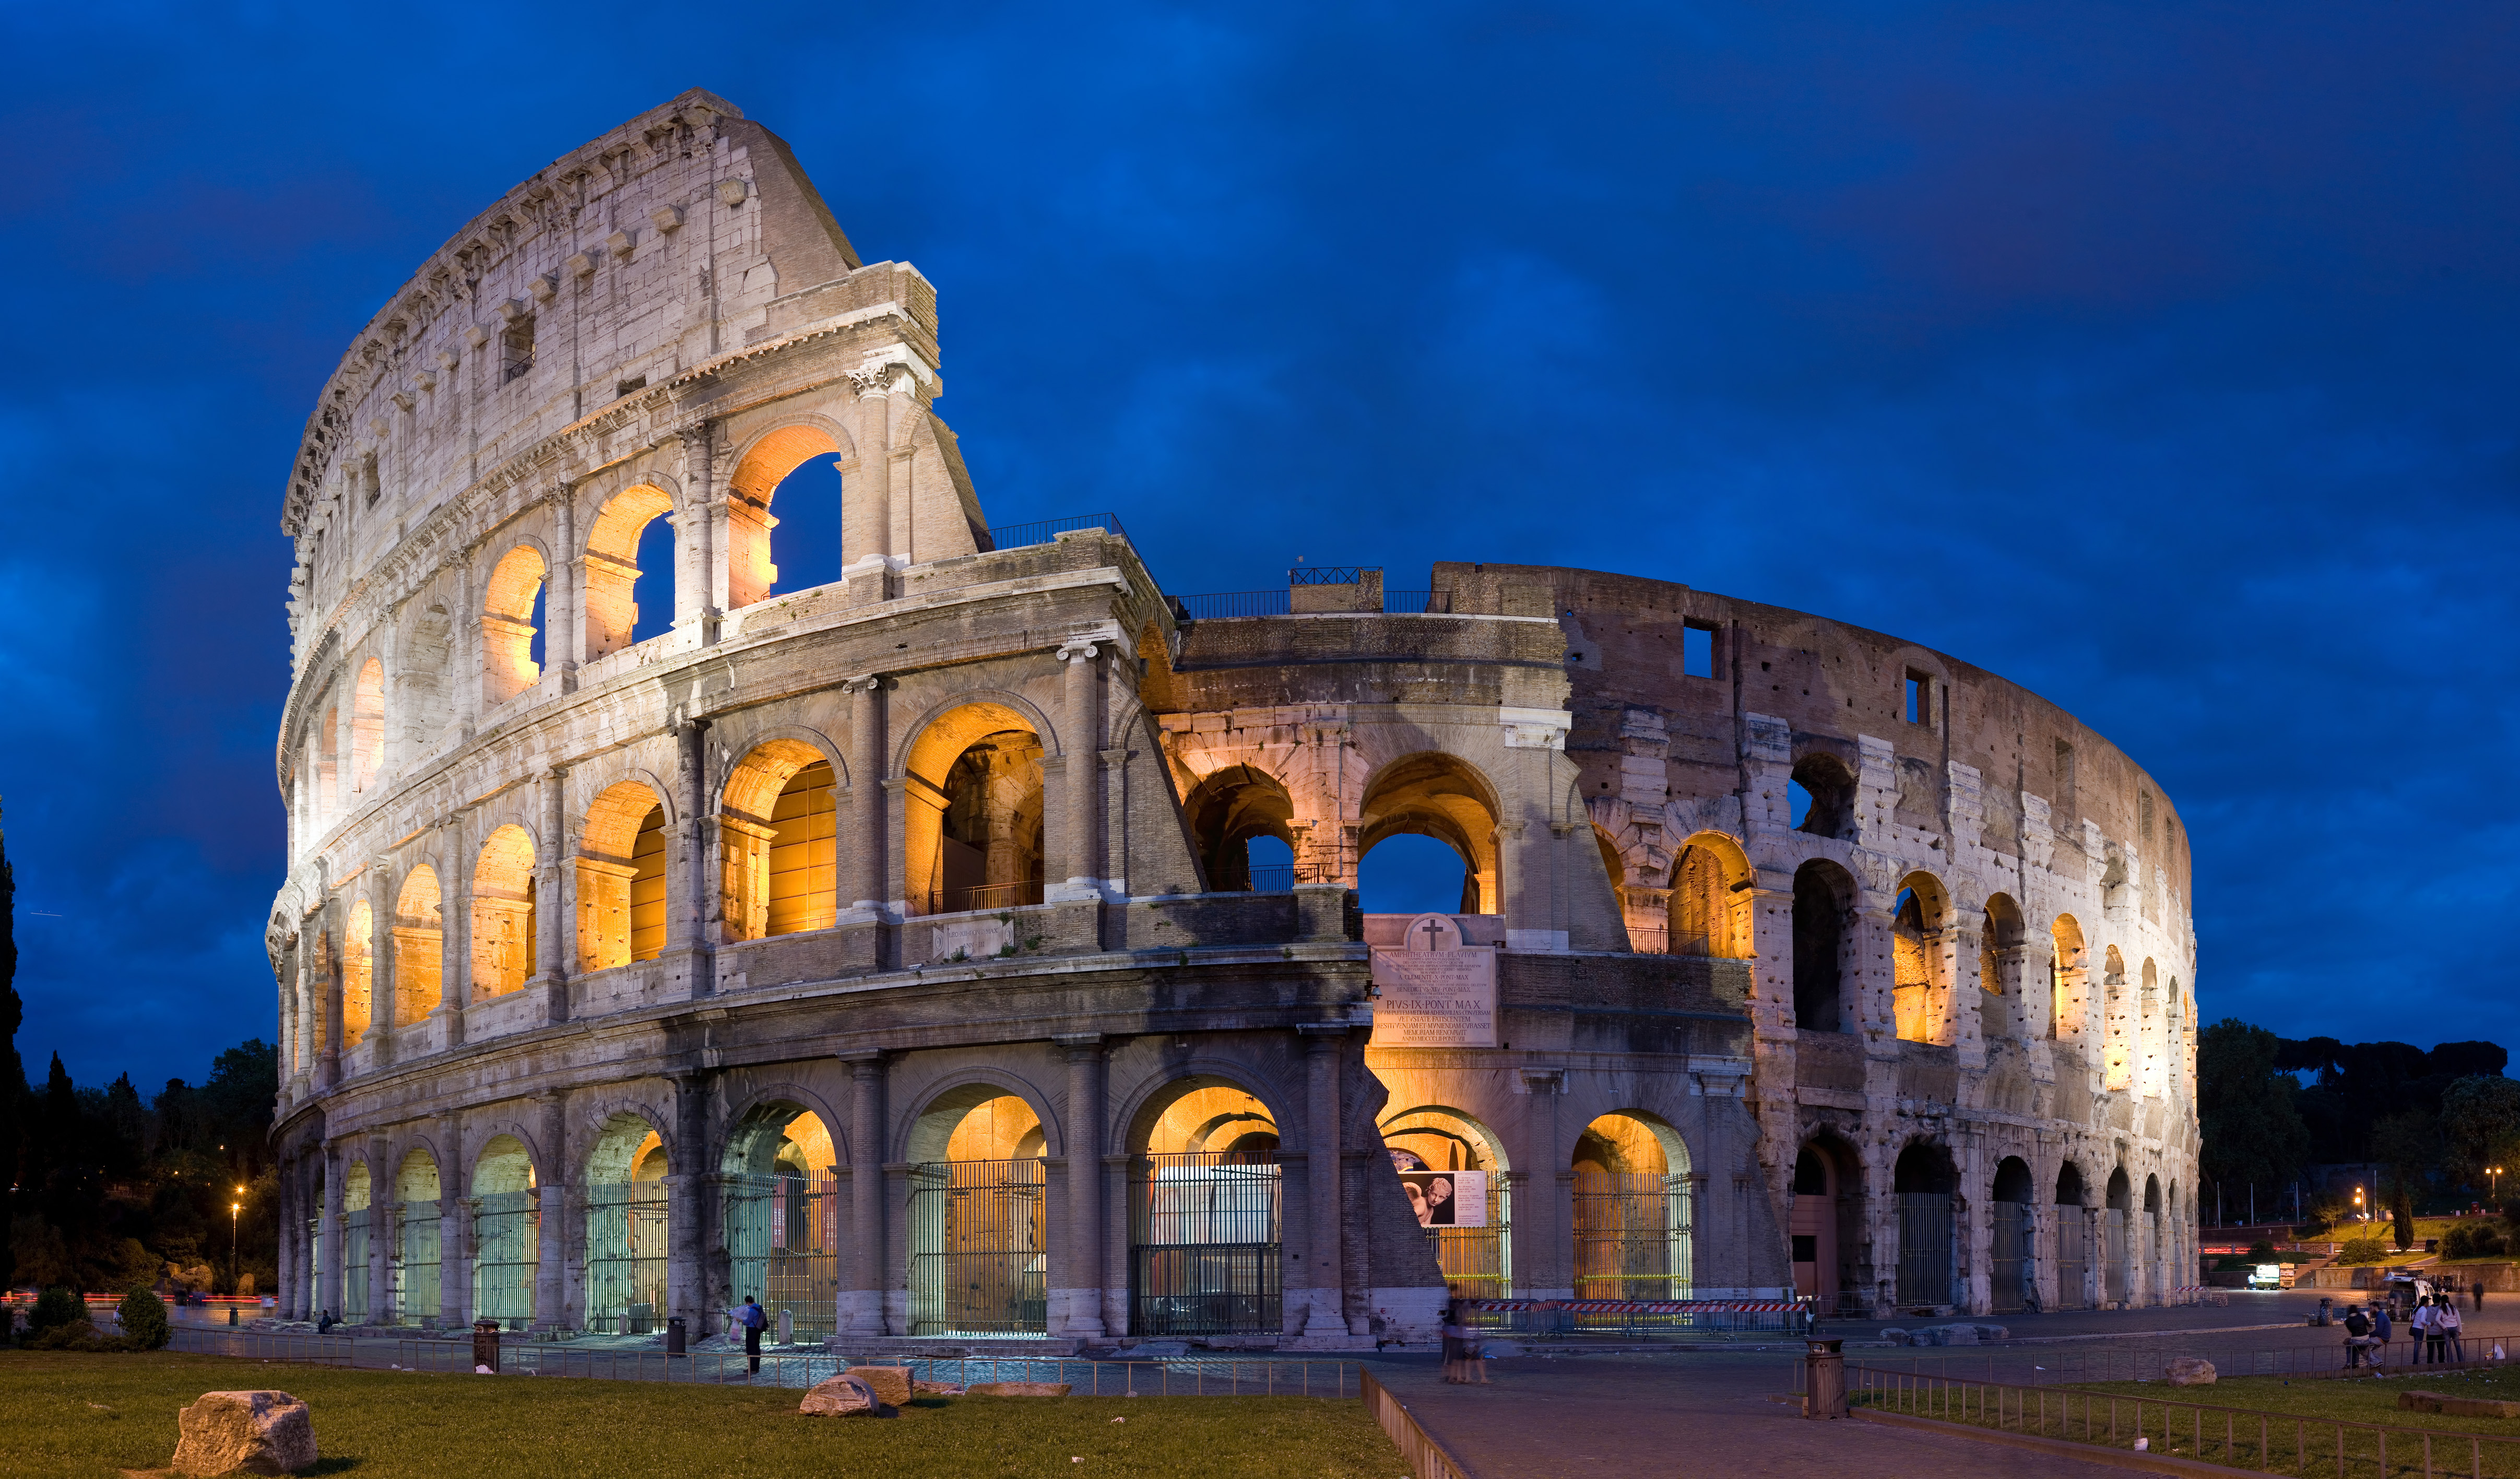 colosseum_in_rome_italy_april_2007_1.jpg